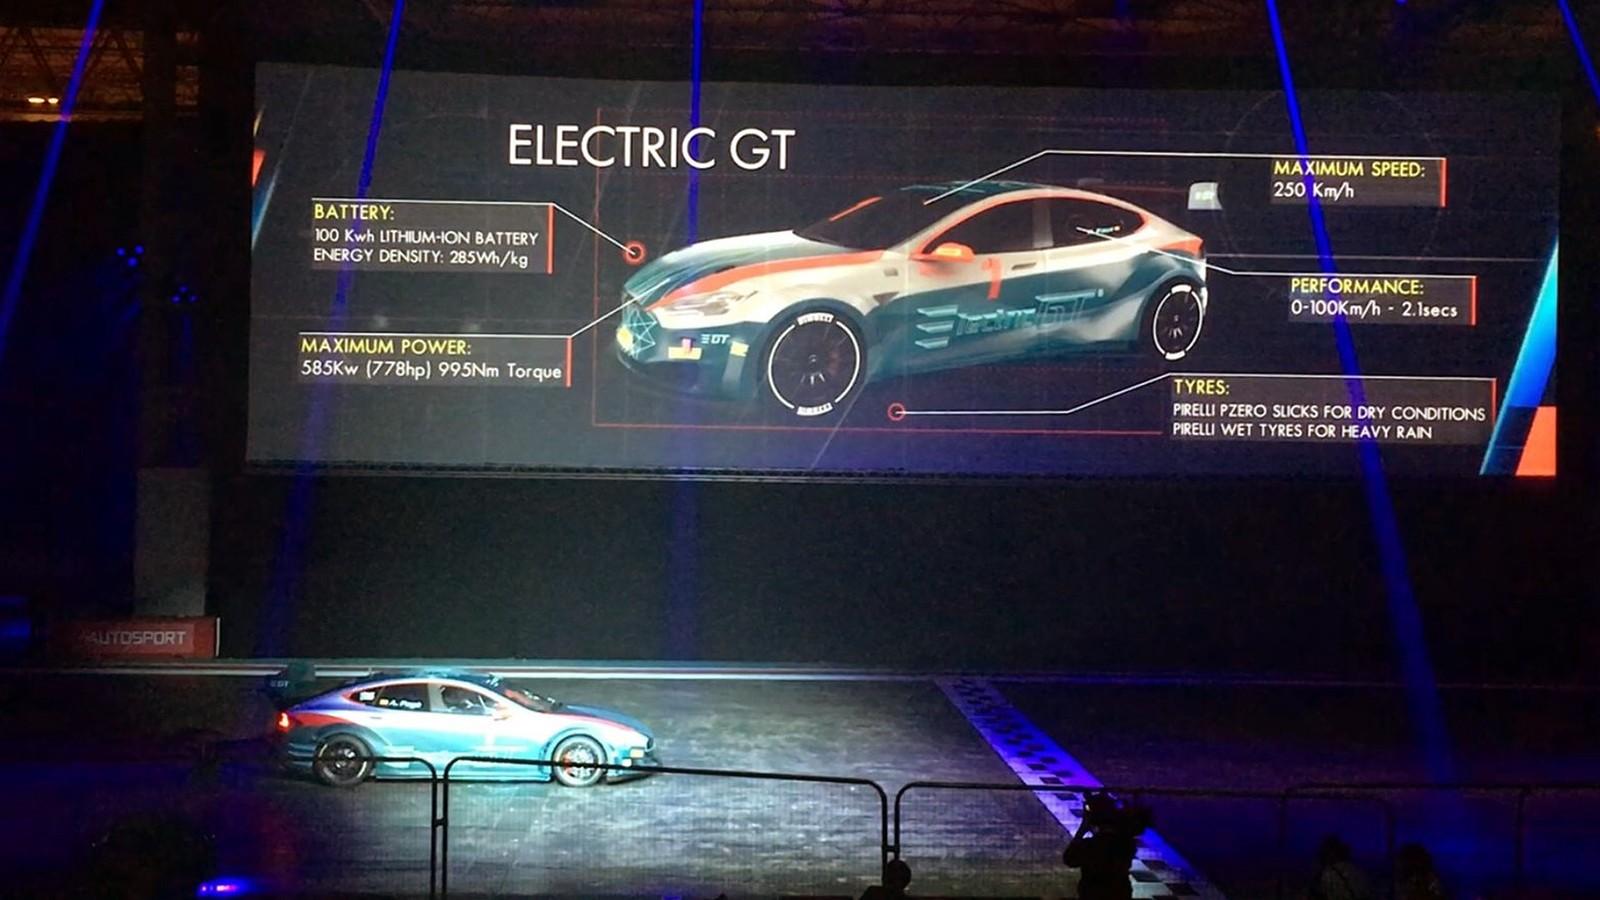 electric-gt-tesla-model-s (5)